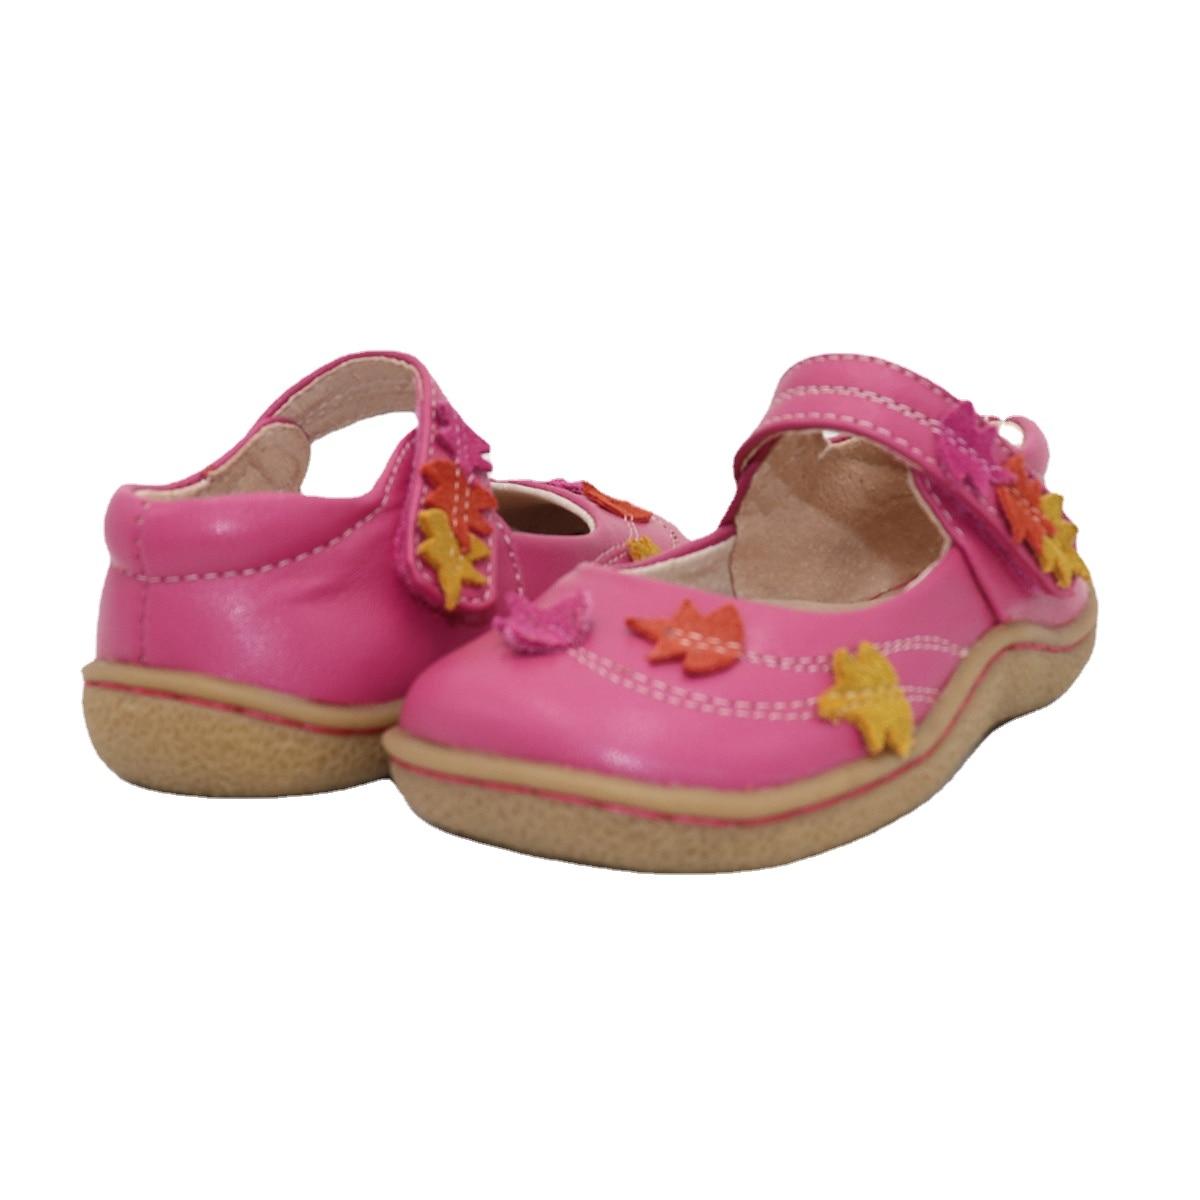 Livie & Luca ماركة عالية الجودة جلد طبيعي أطفال أحذية الأطفال حافي القدمين طفل الفتيان والفتيات أحذية رياضية كاجوال